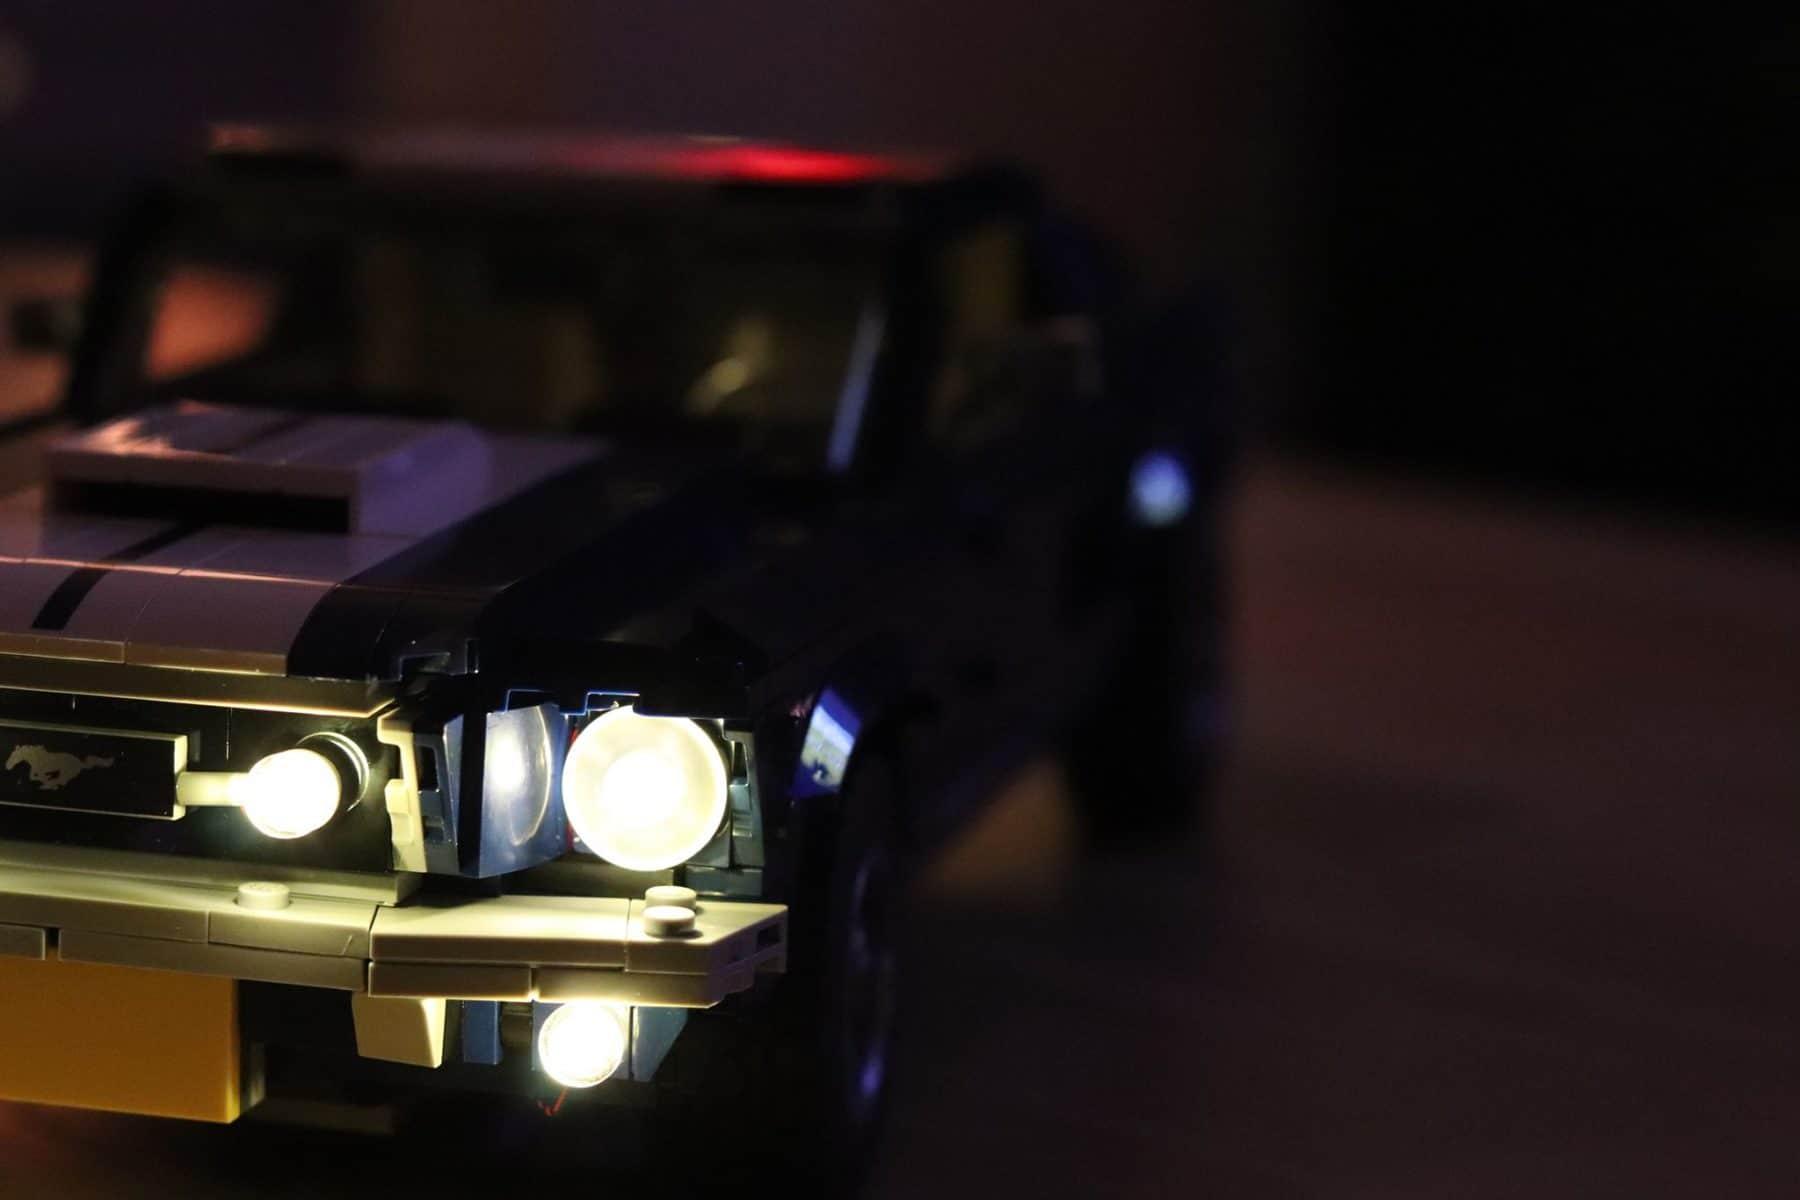 LEGO 10265 Ford Mustang beleuchtet